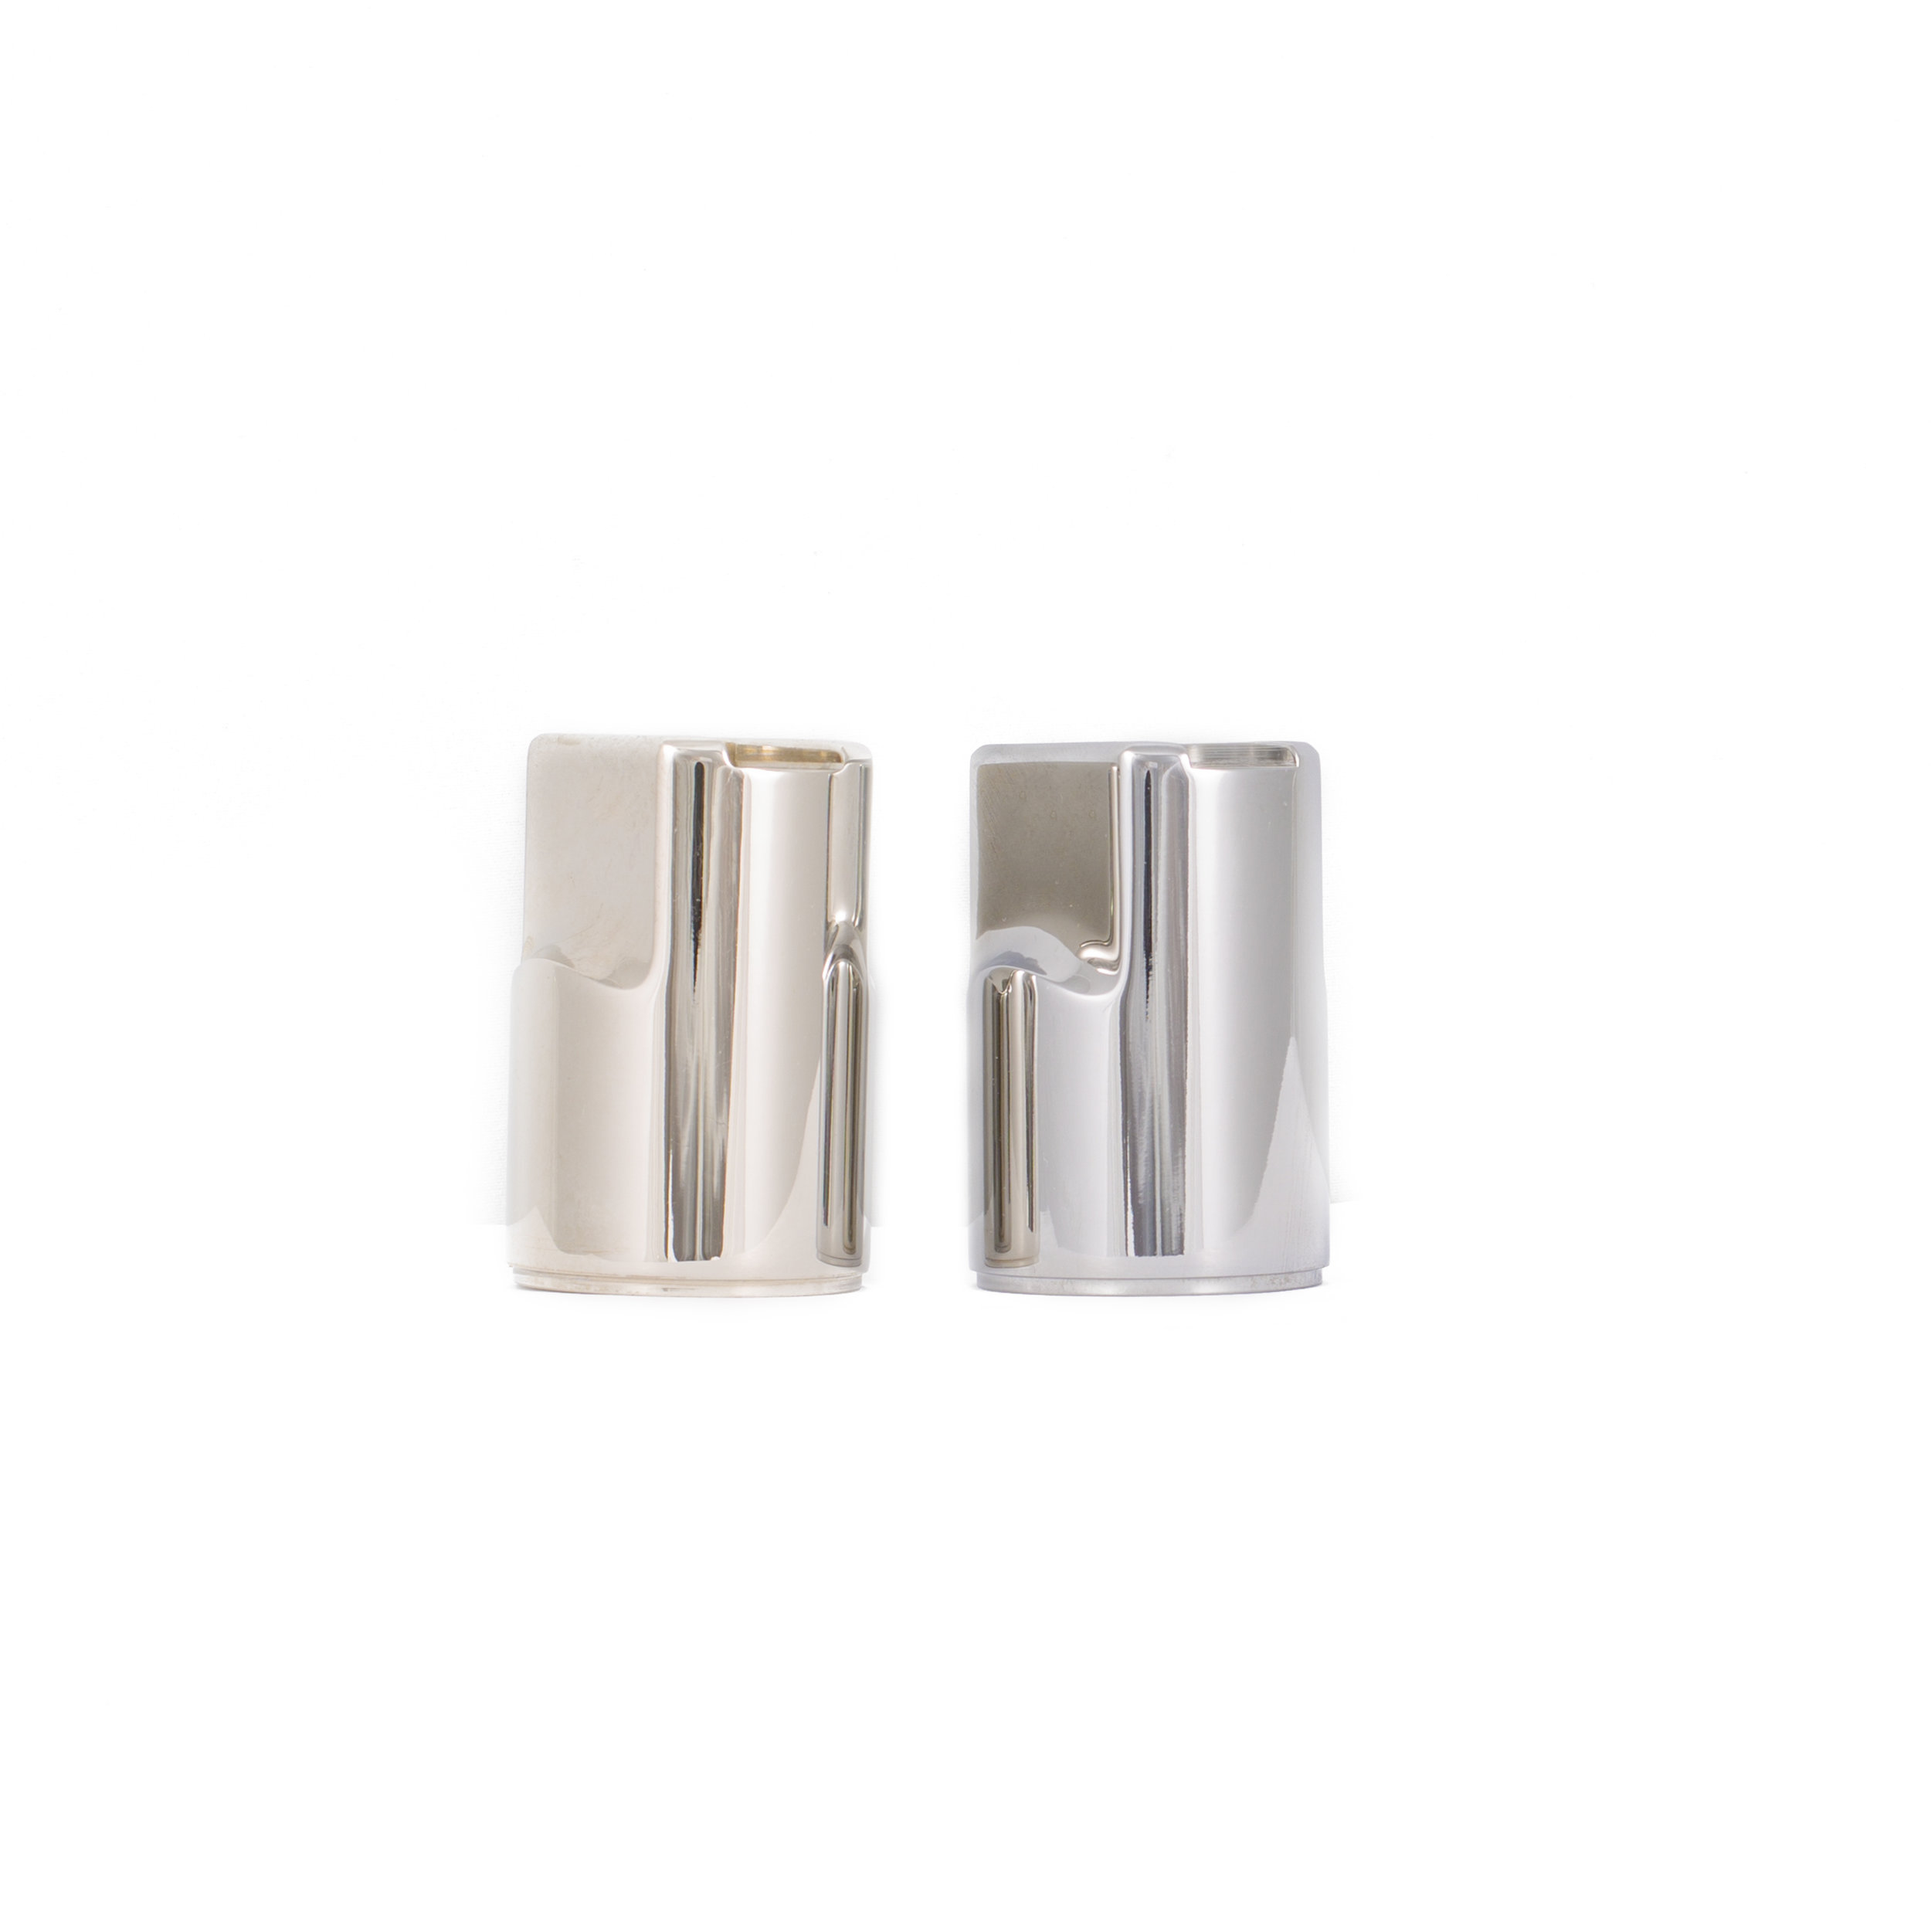 polished nickel vs. chrome